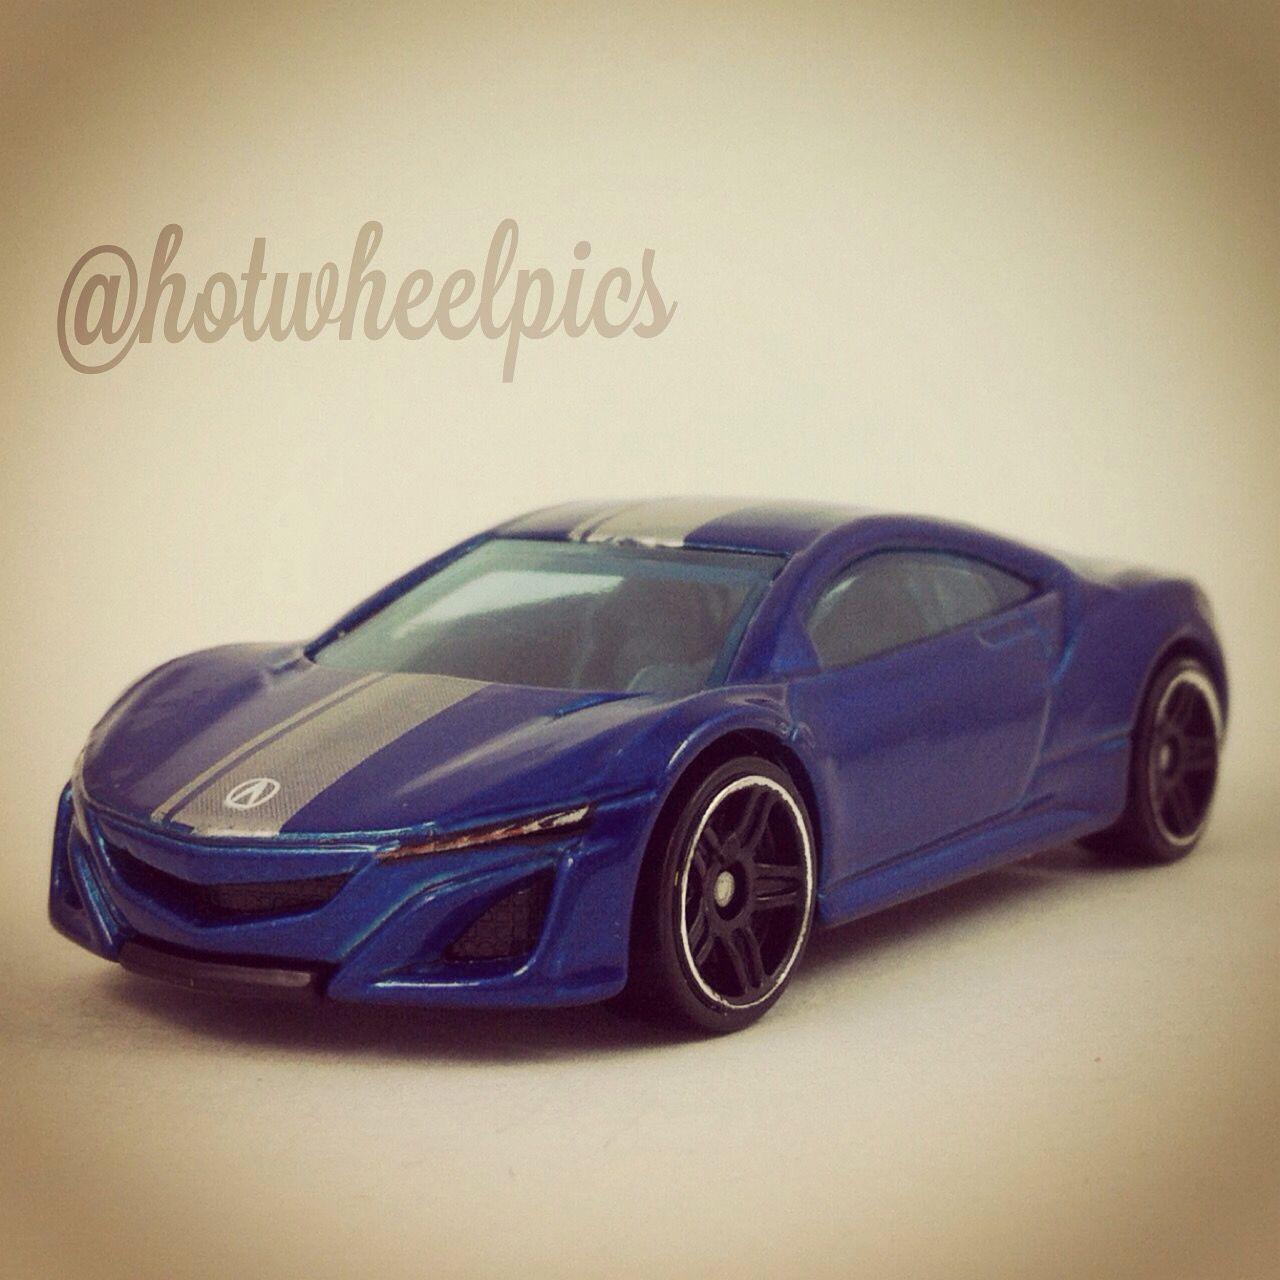 '12 Acura NSX Concept